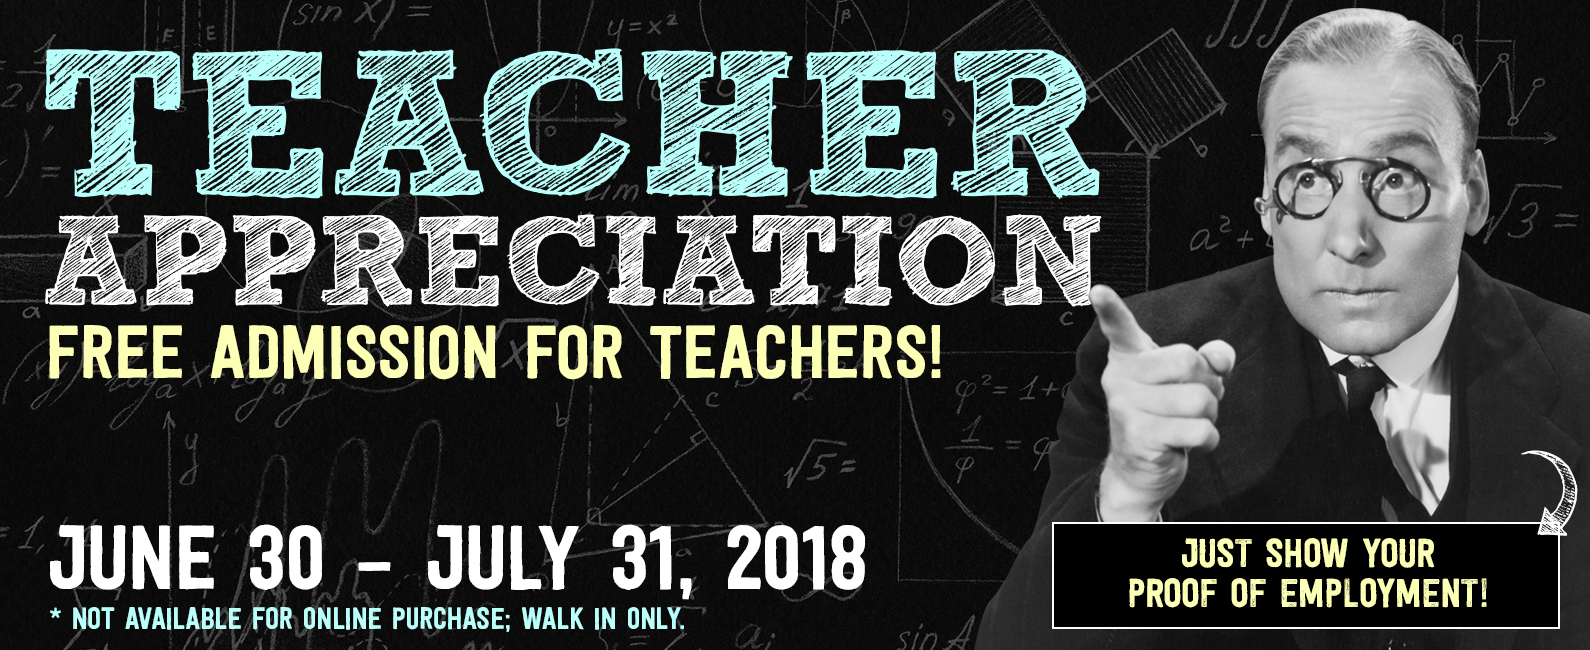 teacherslider